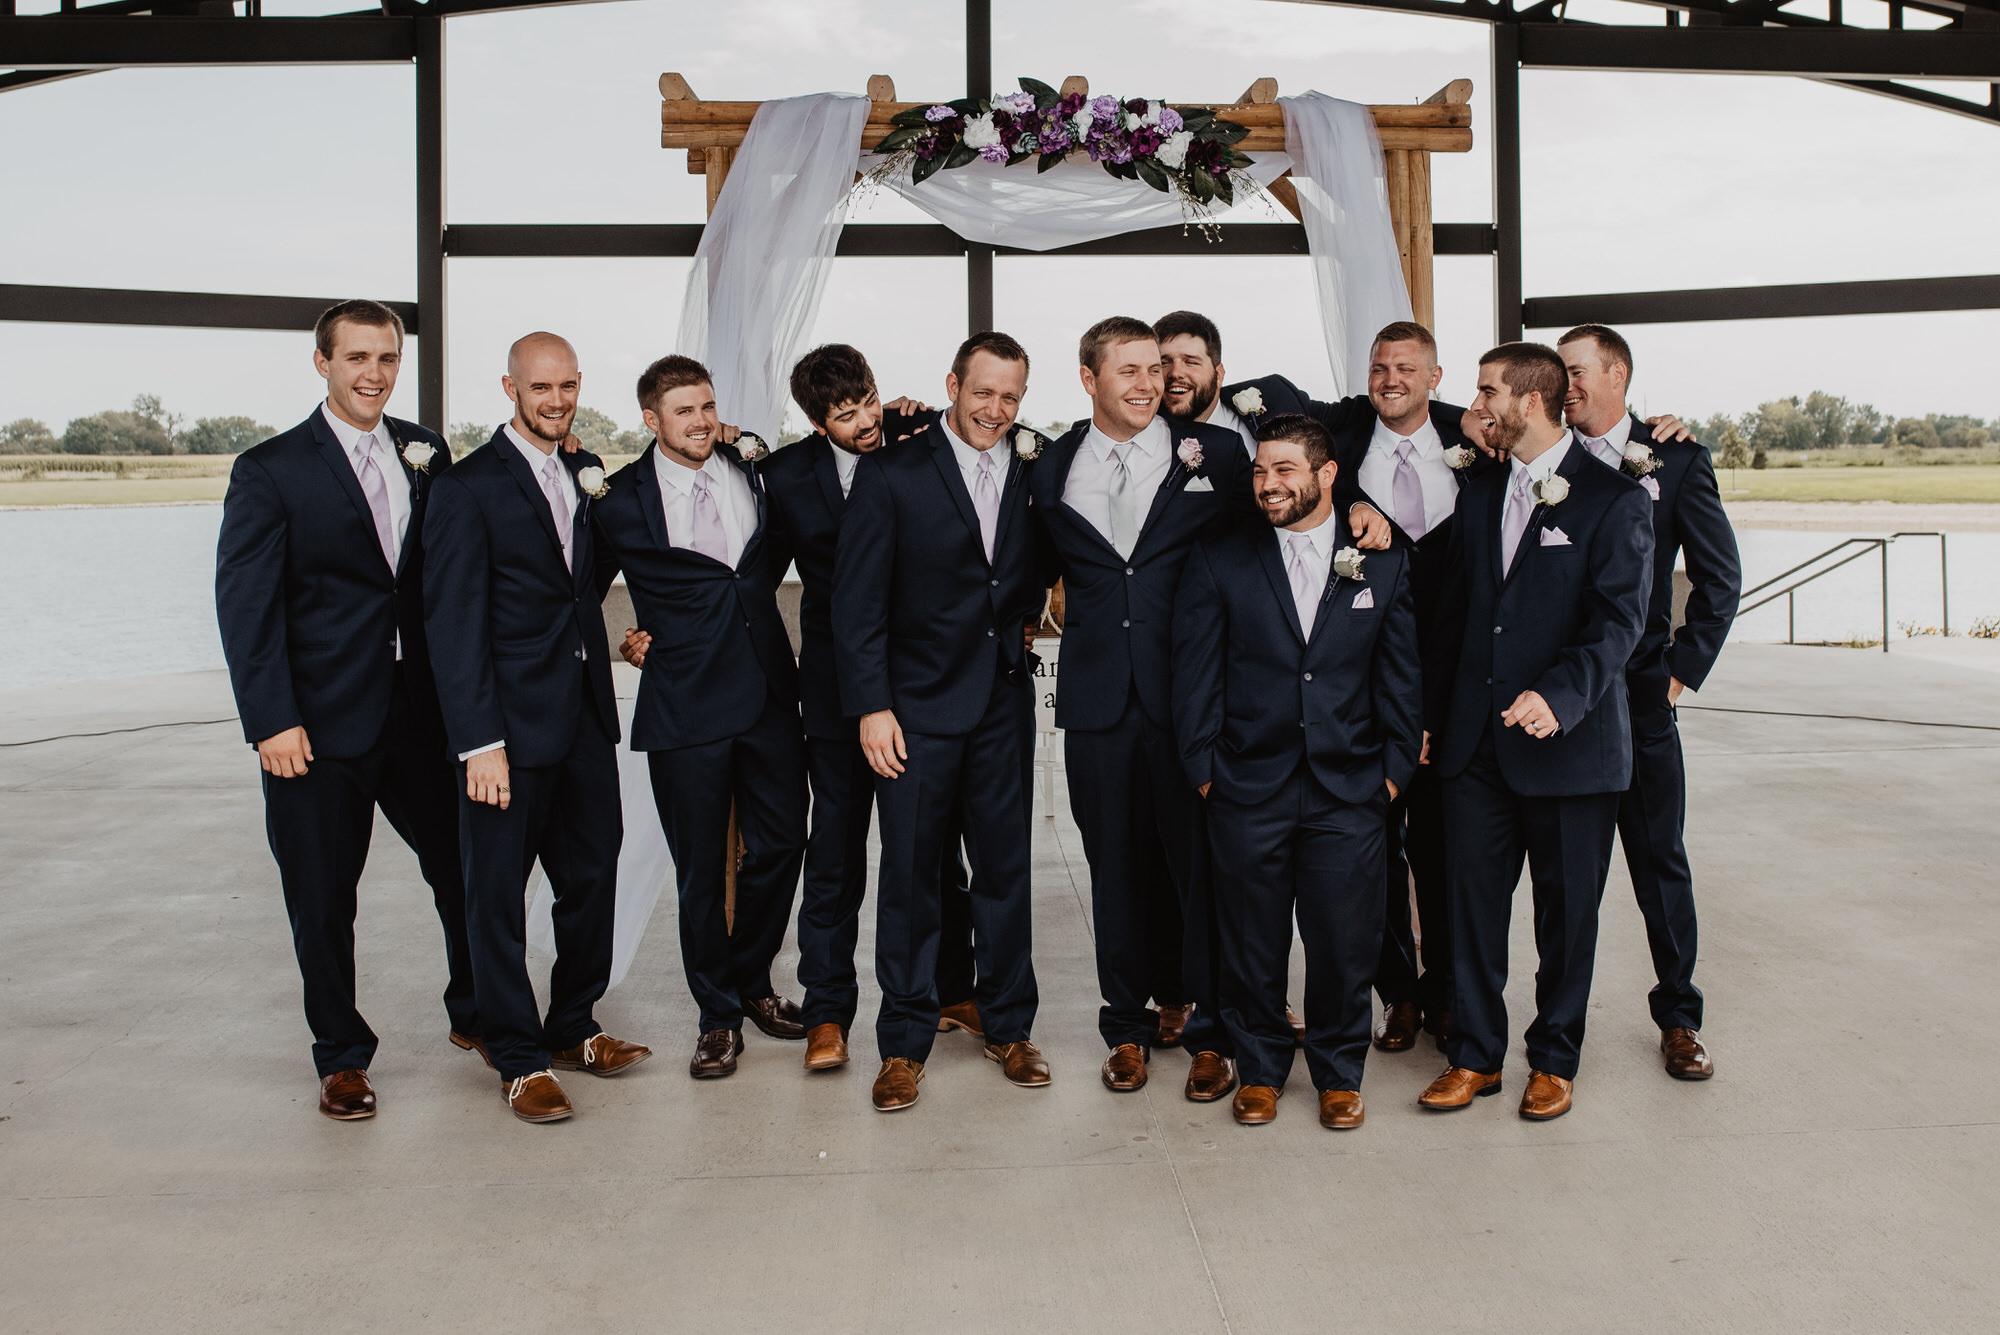 Kaylie Sirek Photography – Nebraska Wedding and Engagement Photographer – Yanney Park Kearney Nebraska – 38.jpg